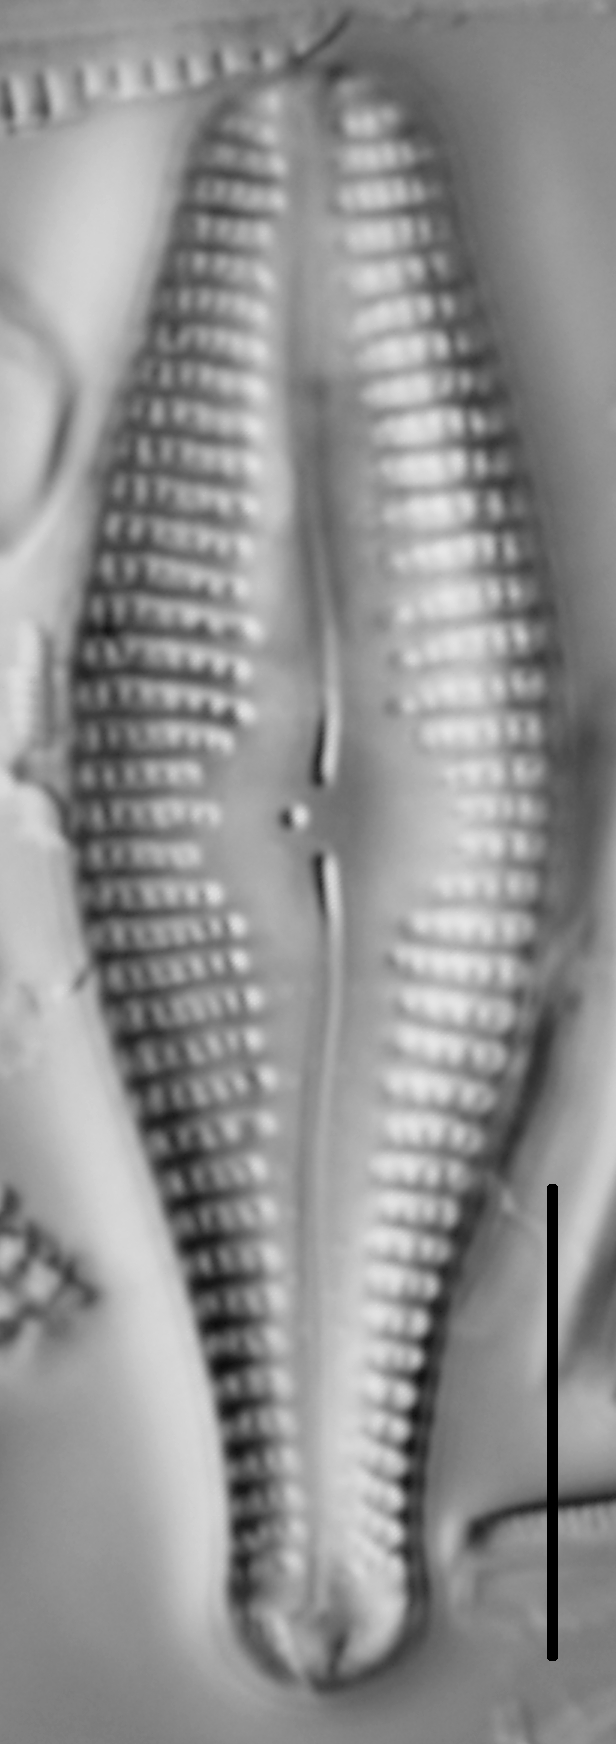 Gomphonema ventricosum LM4